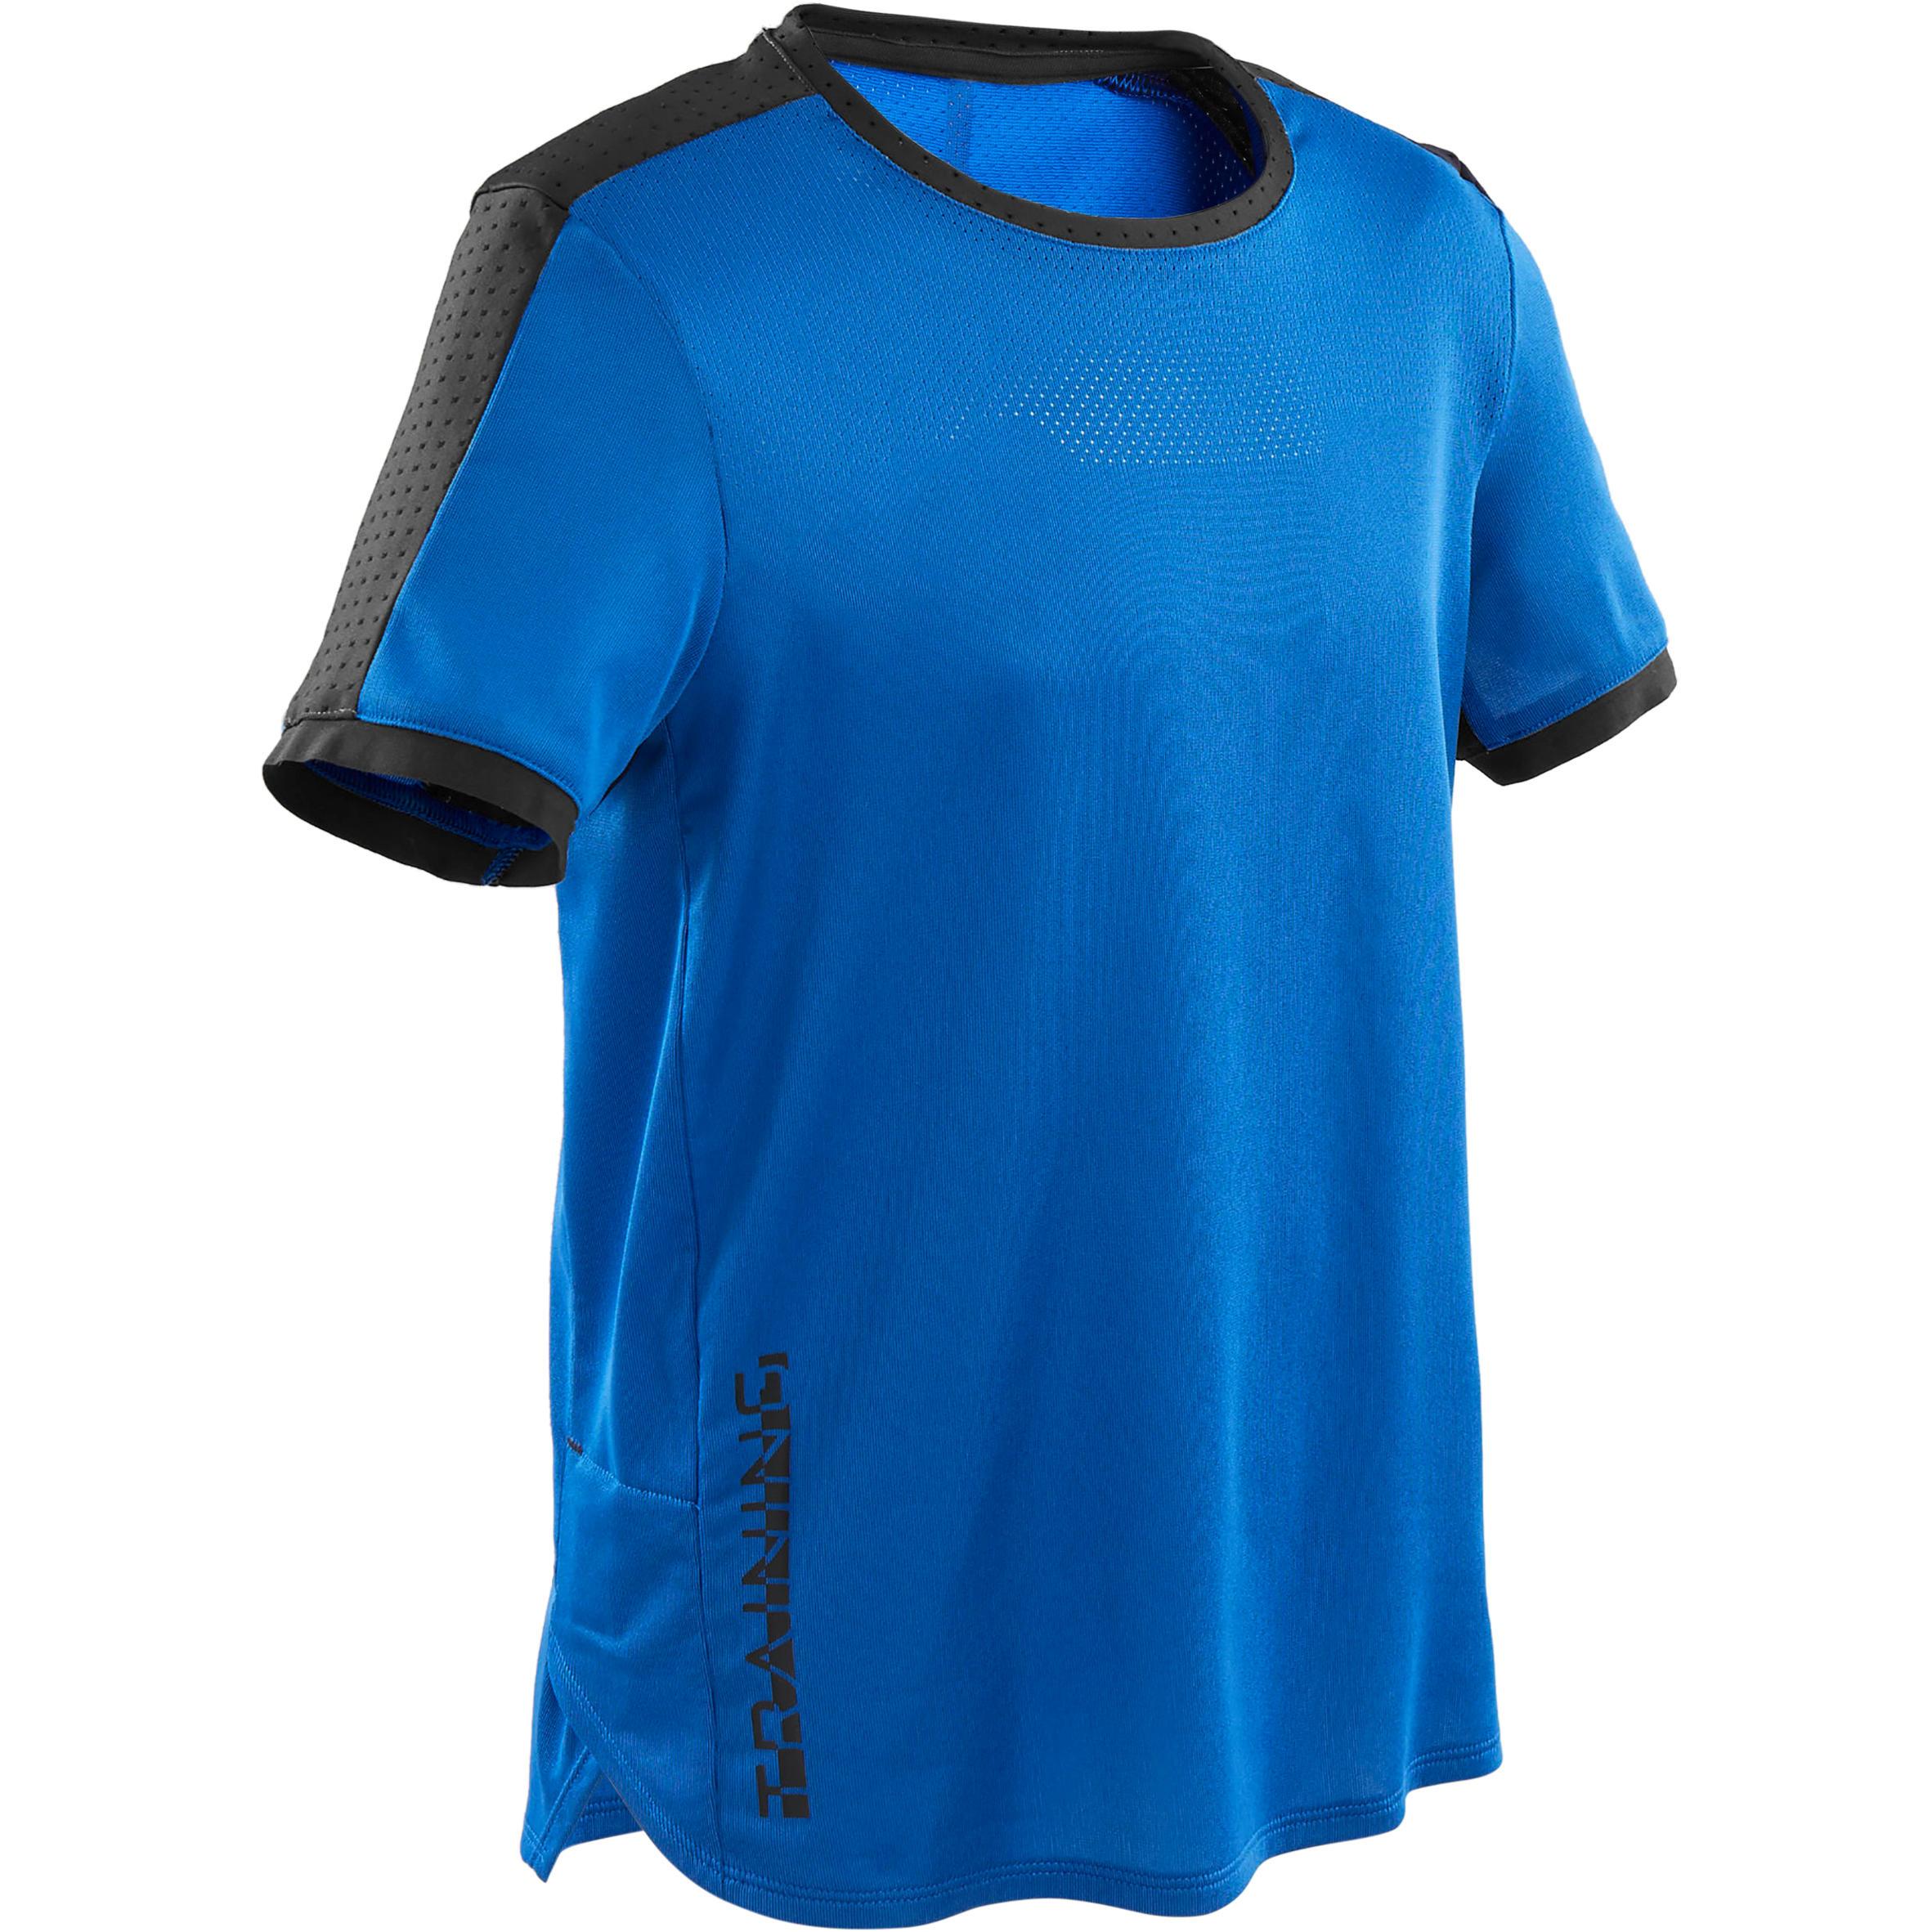 Domyos T-shirt respirant et technique, S900 garçon GYM ENFANT bleu - Domyos